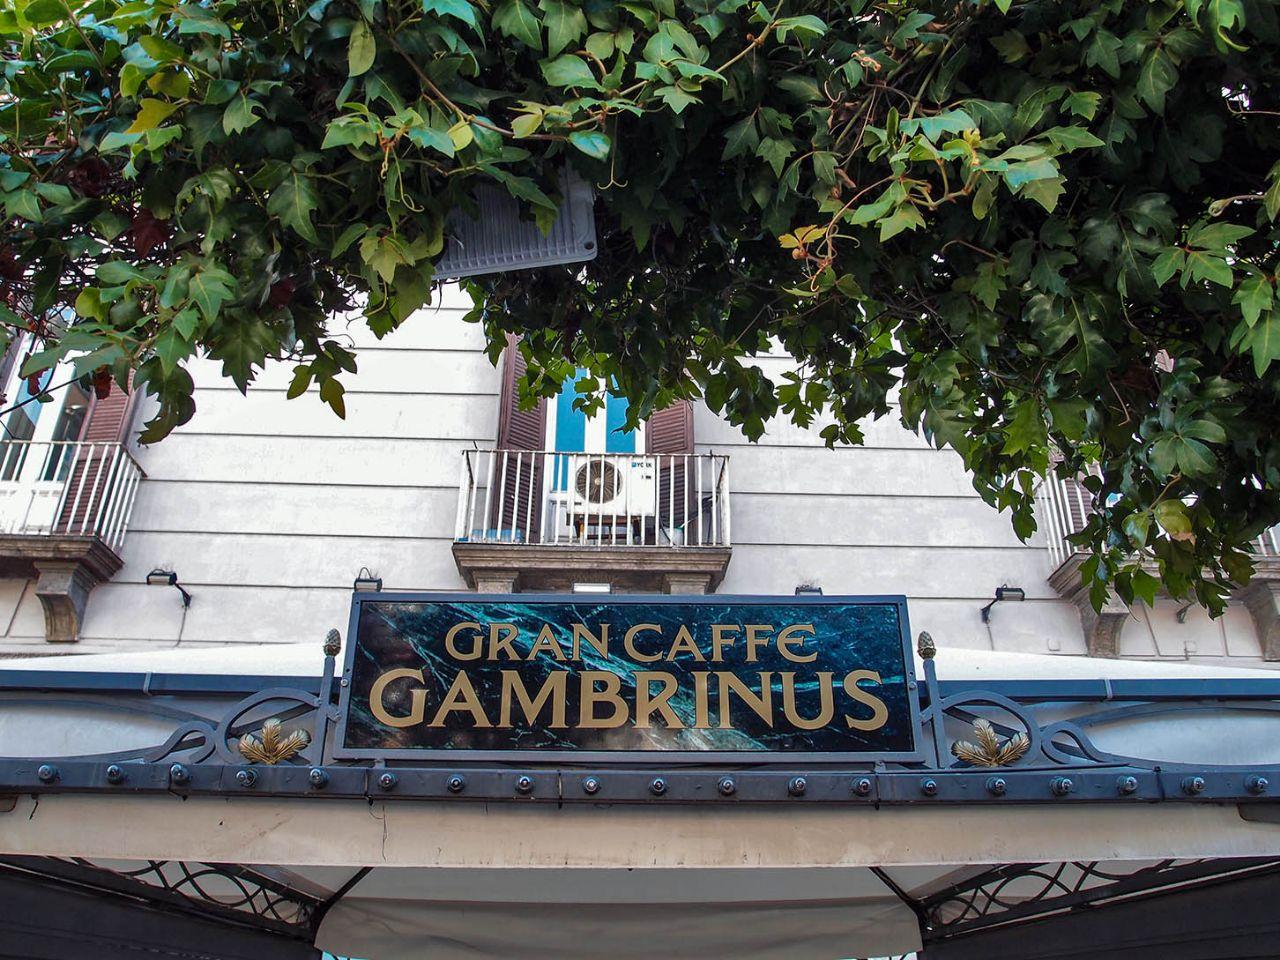 Гран кафе Гамбринус Неаполь, Италия